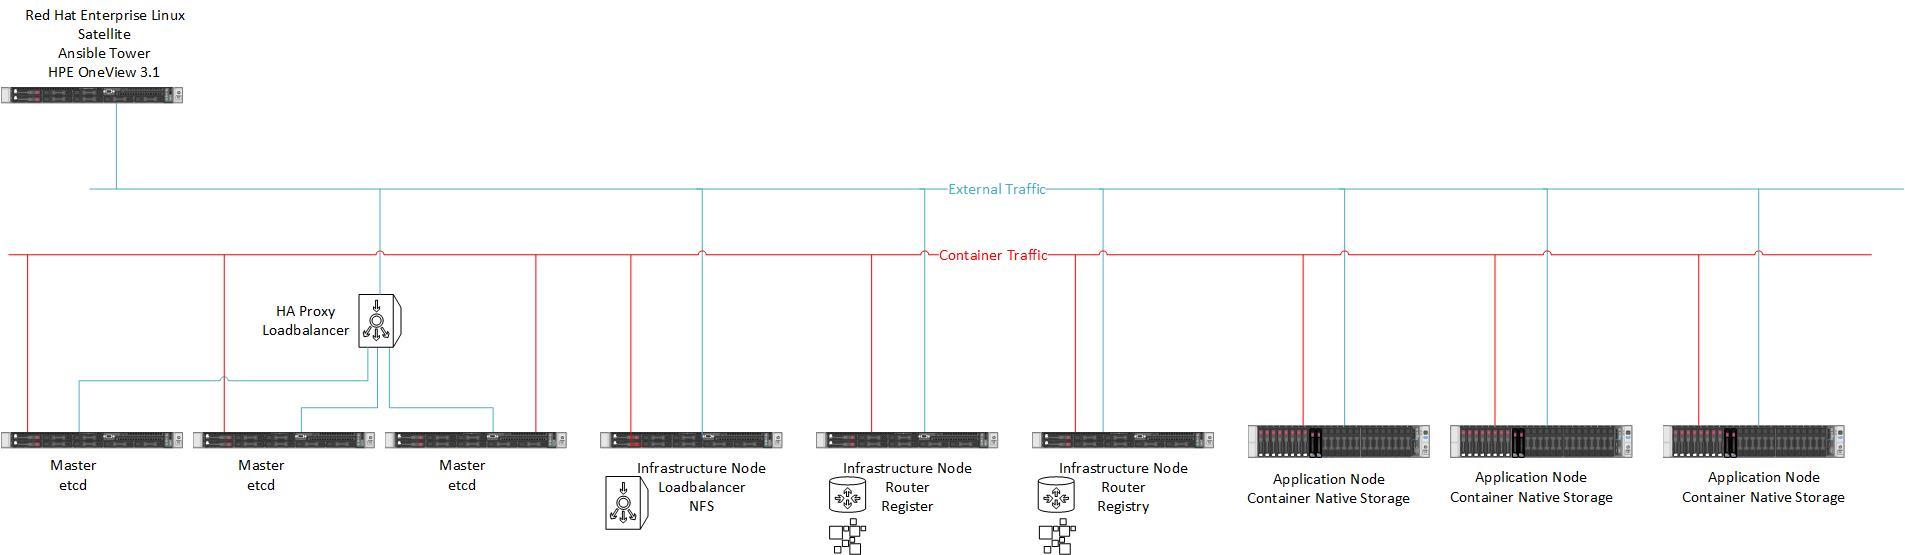 Red Hat OpenShift Container Platform Deployment